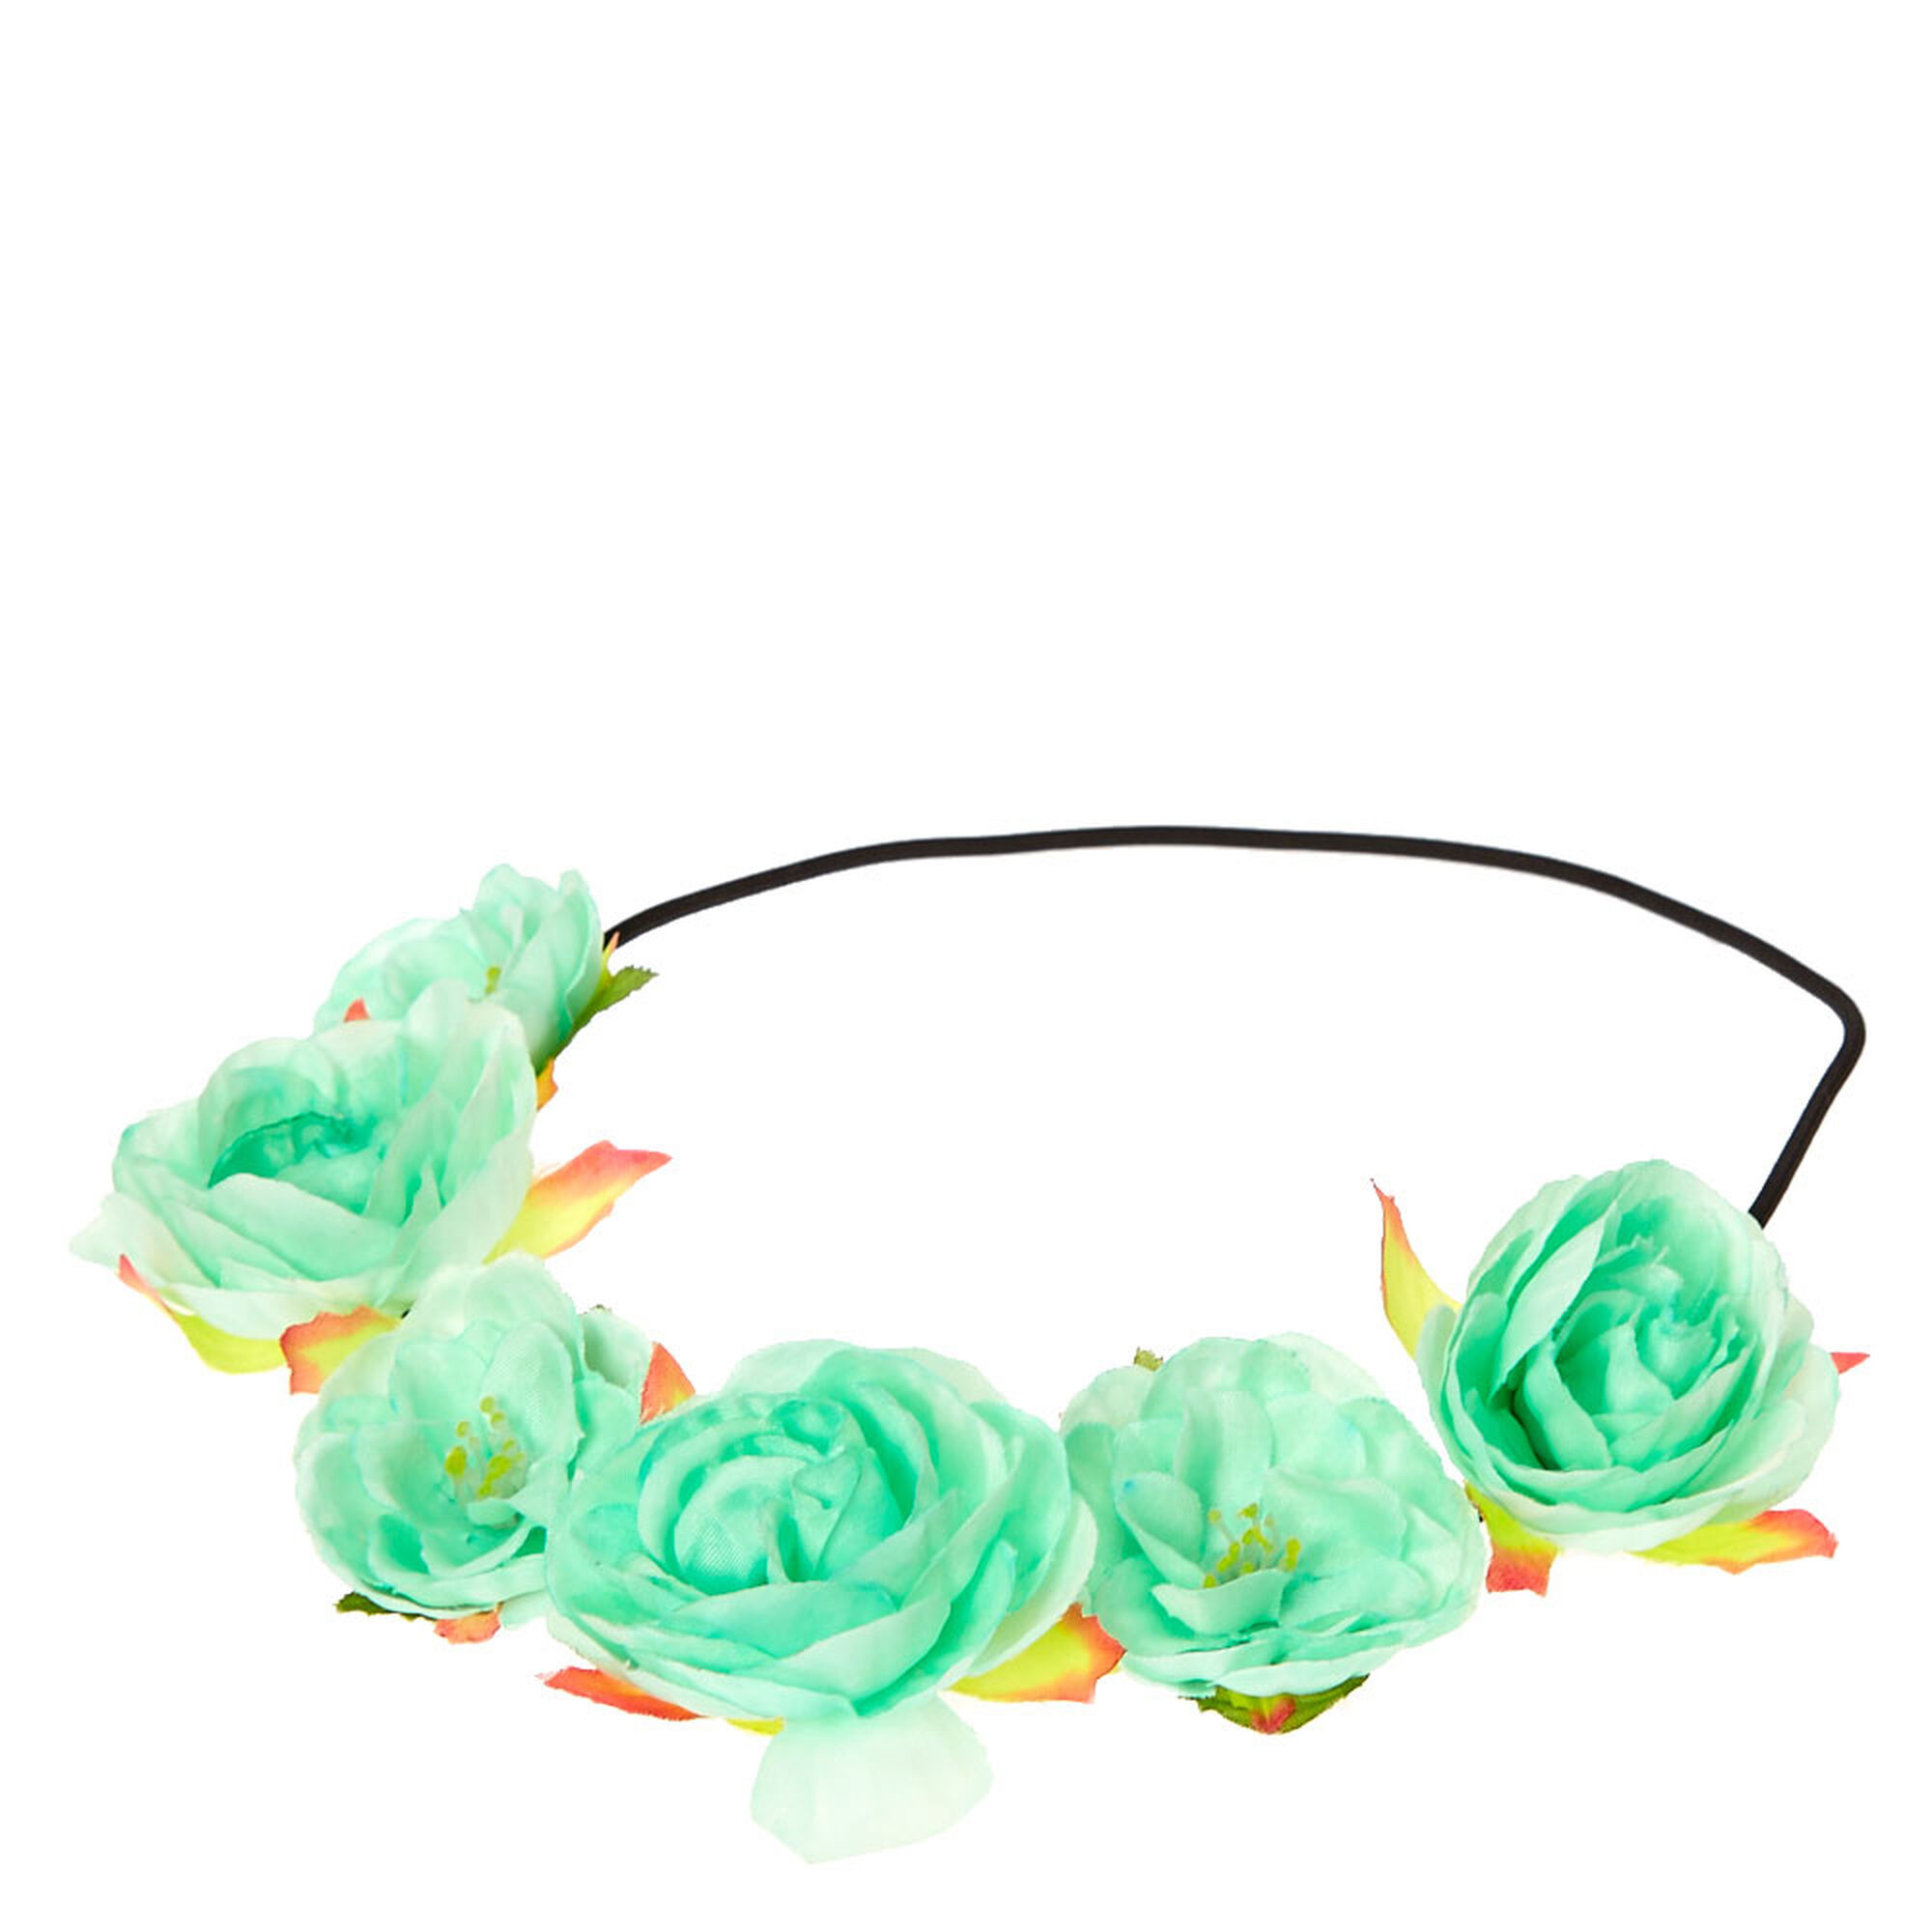 Mint flower crown headwrap claires mint flower crown headwrap izmirmasajfo